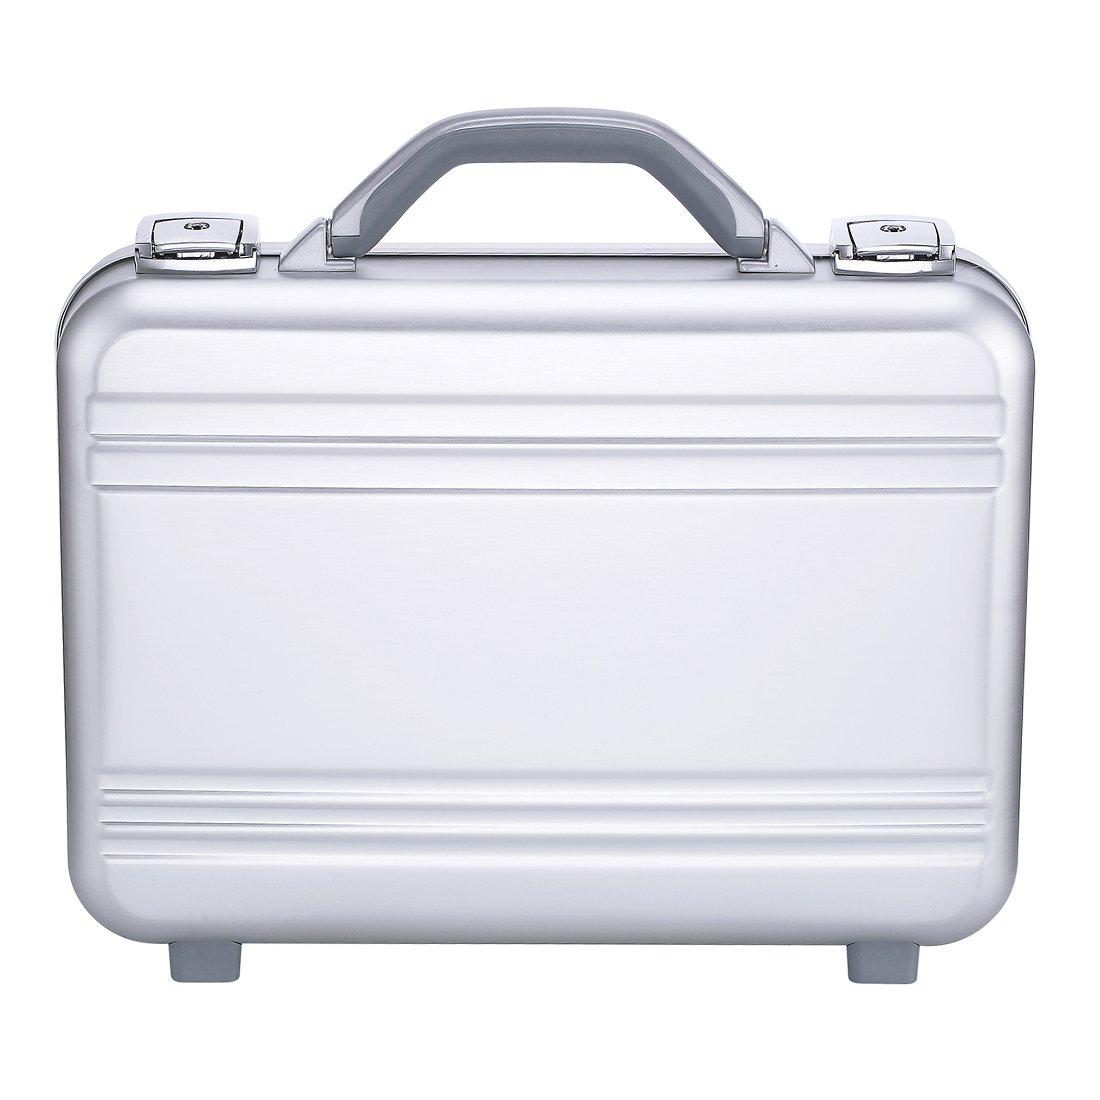 Attache case Metal Aluminum for men women Business foam gun tool writing Organizer Laptop Briefcase small larger silver(Silver, 14.6X10.6X3.7 Inch)